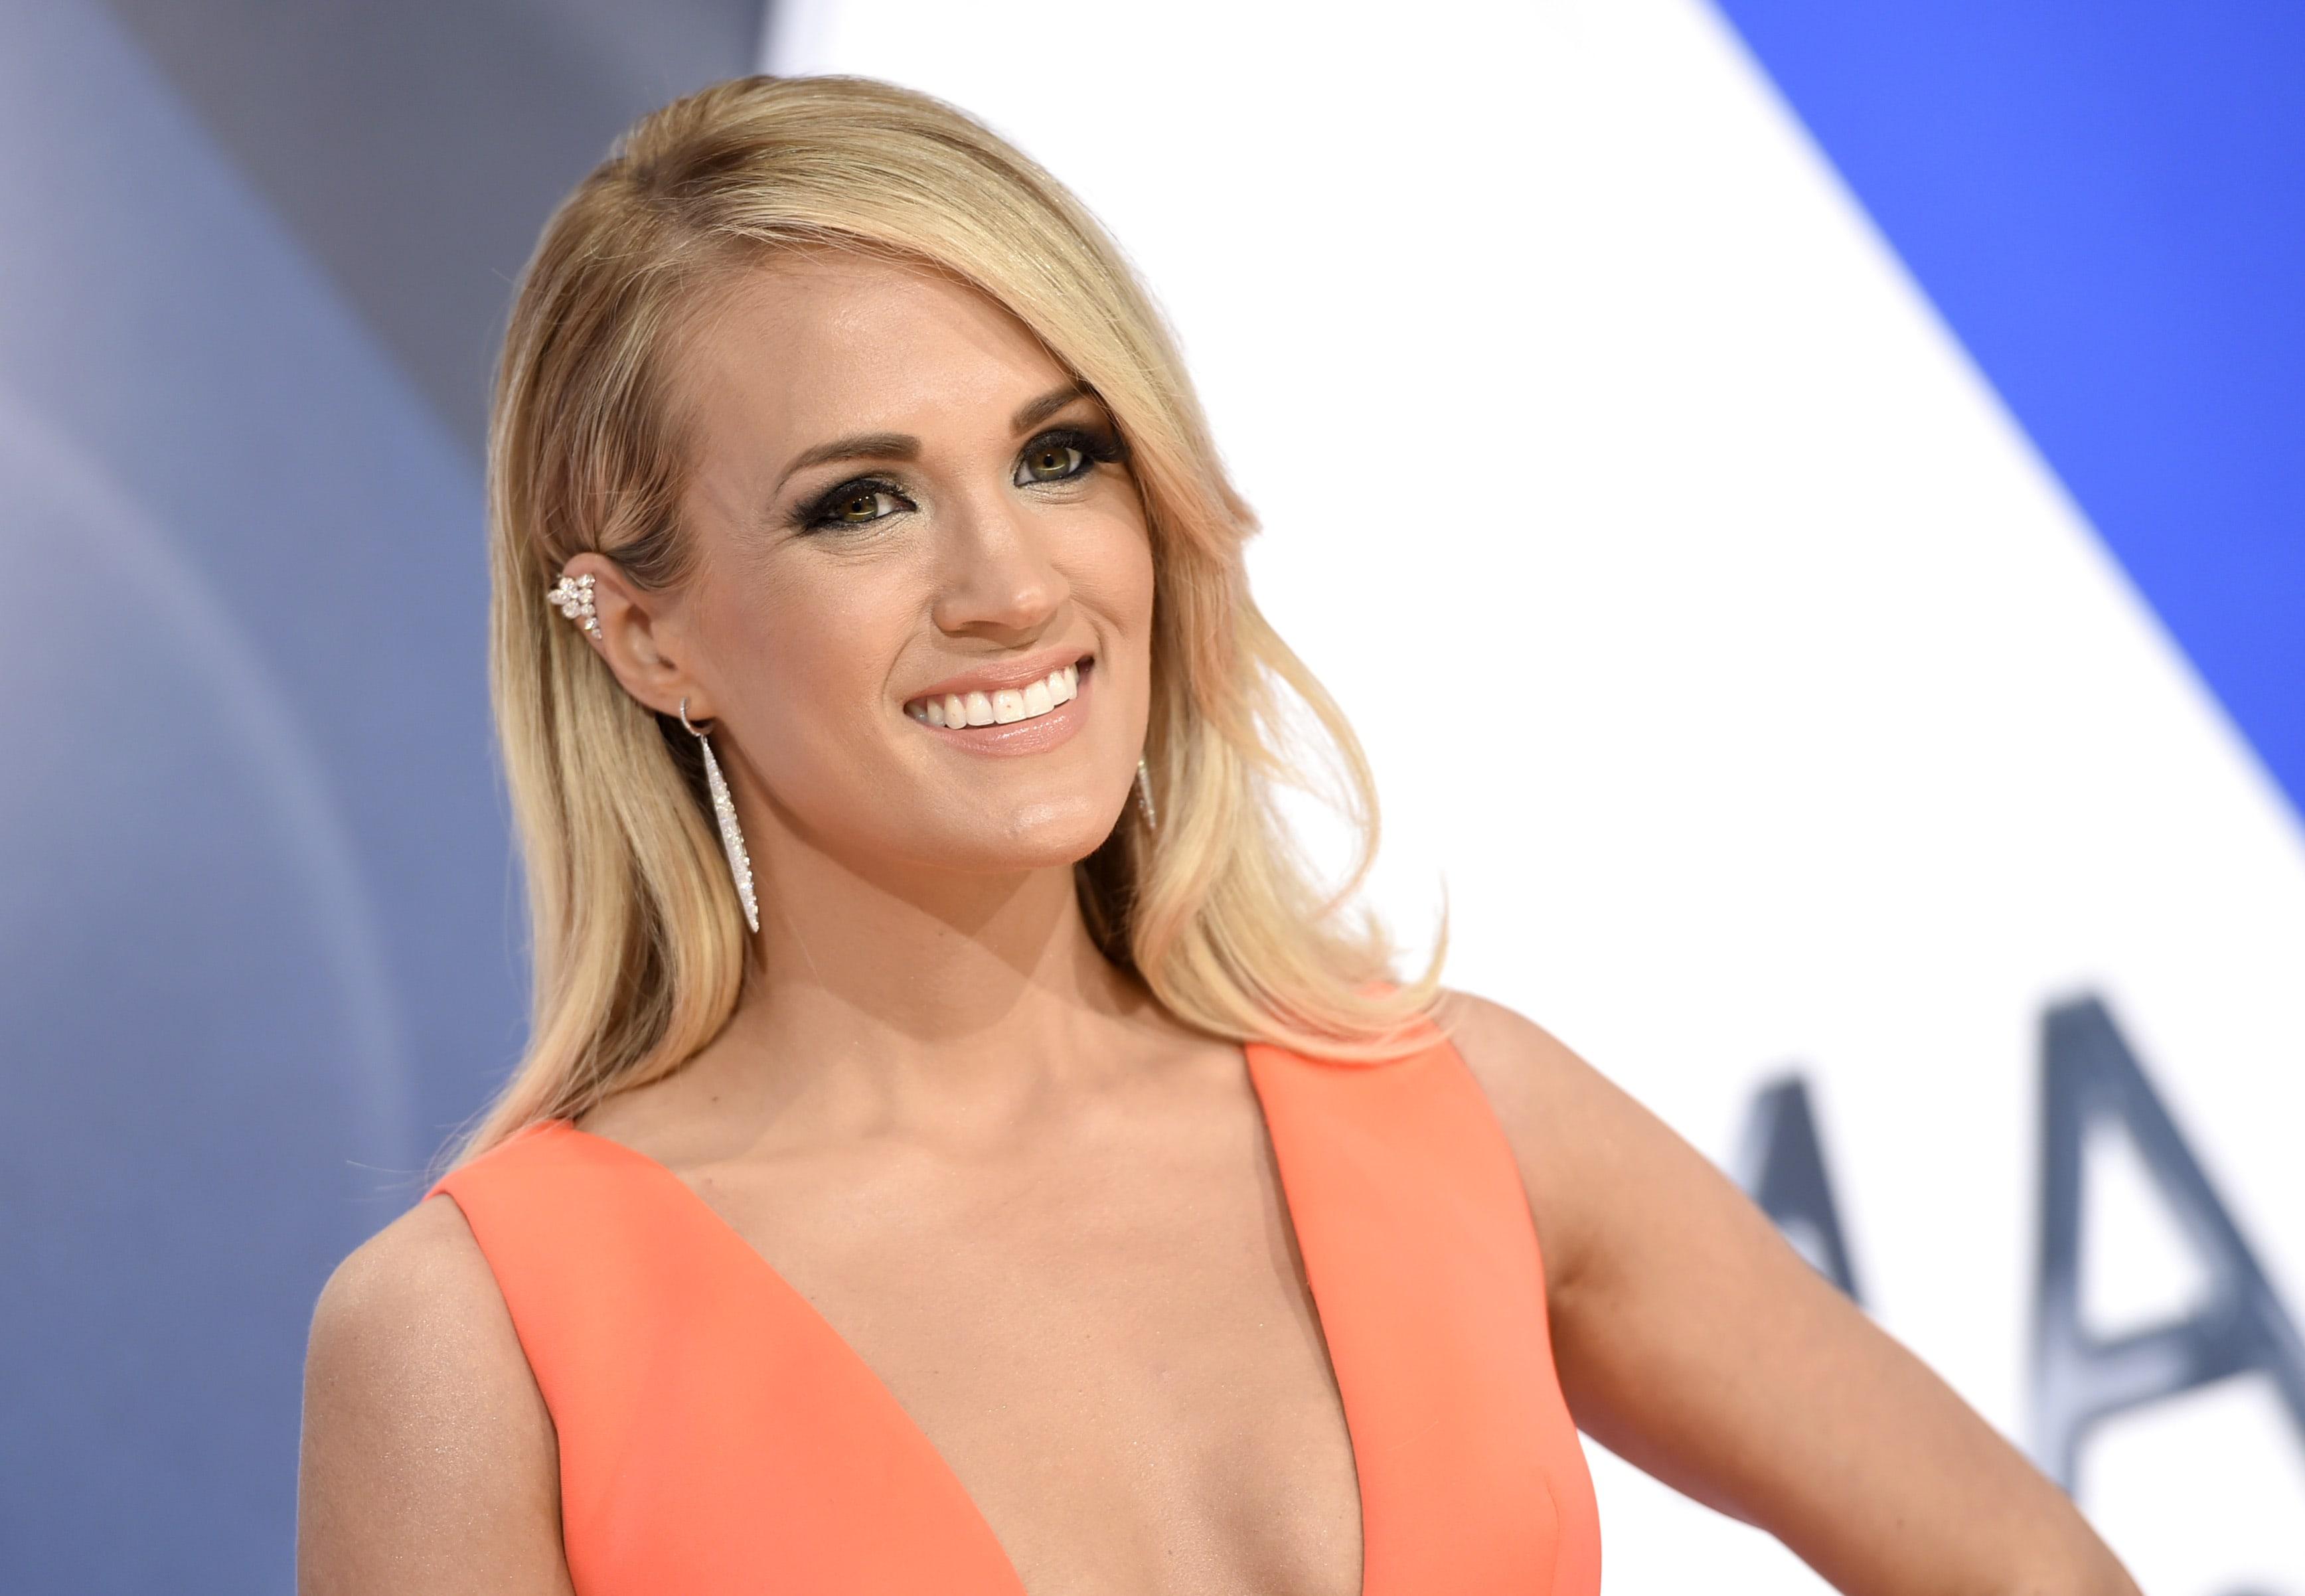 Carrie Underwood HD pics